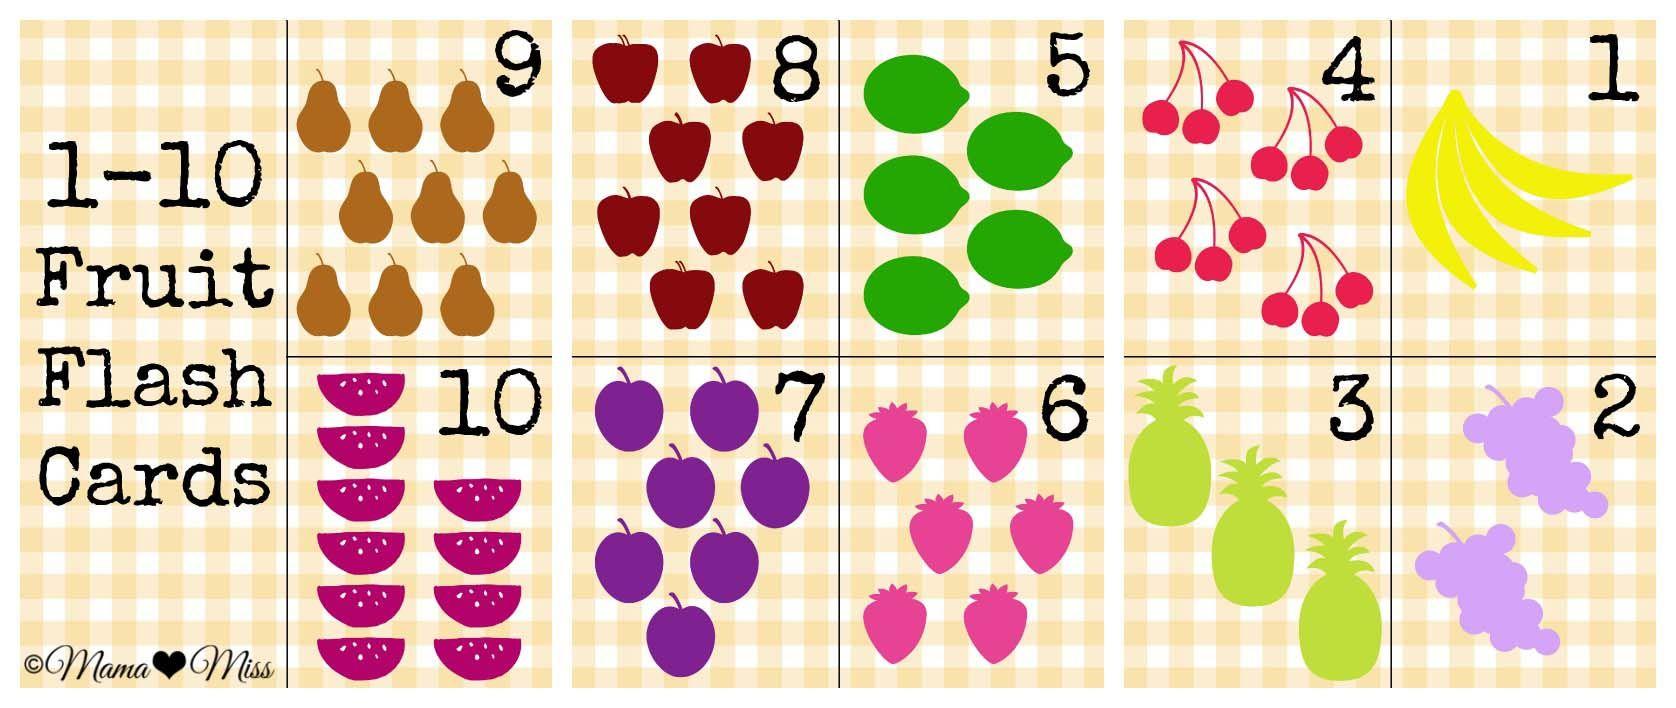 1 10 free fruit flash cards free printable numbers printable flashcards free printables